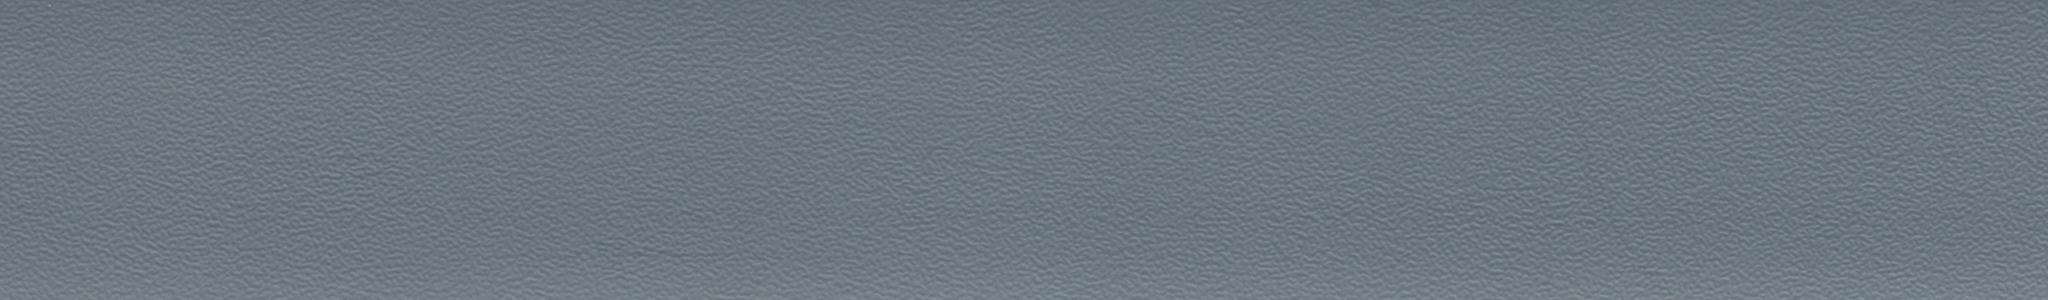 HU 17015 кромка ABS серая жемчуг 101